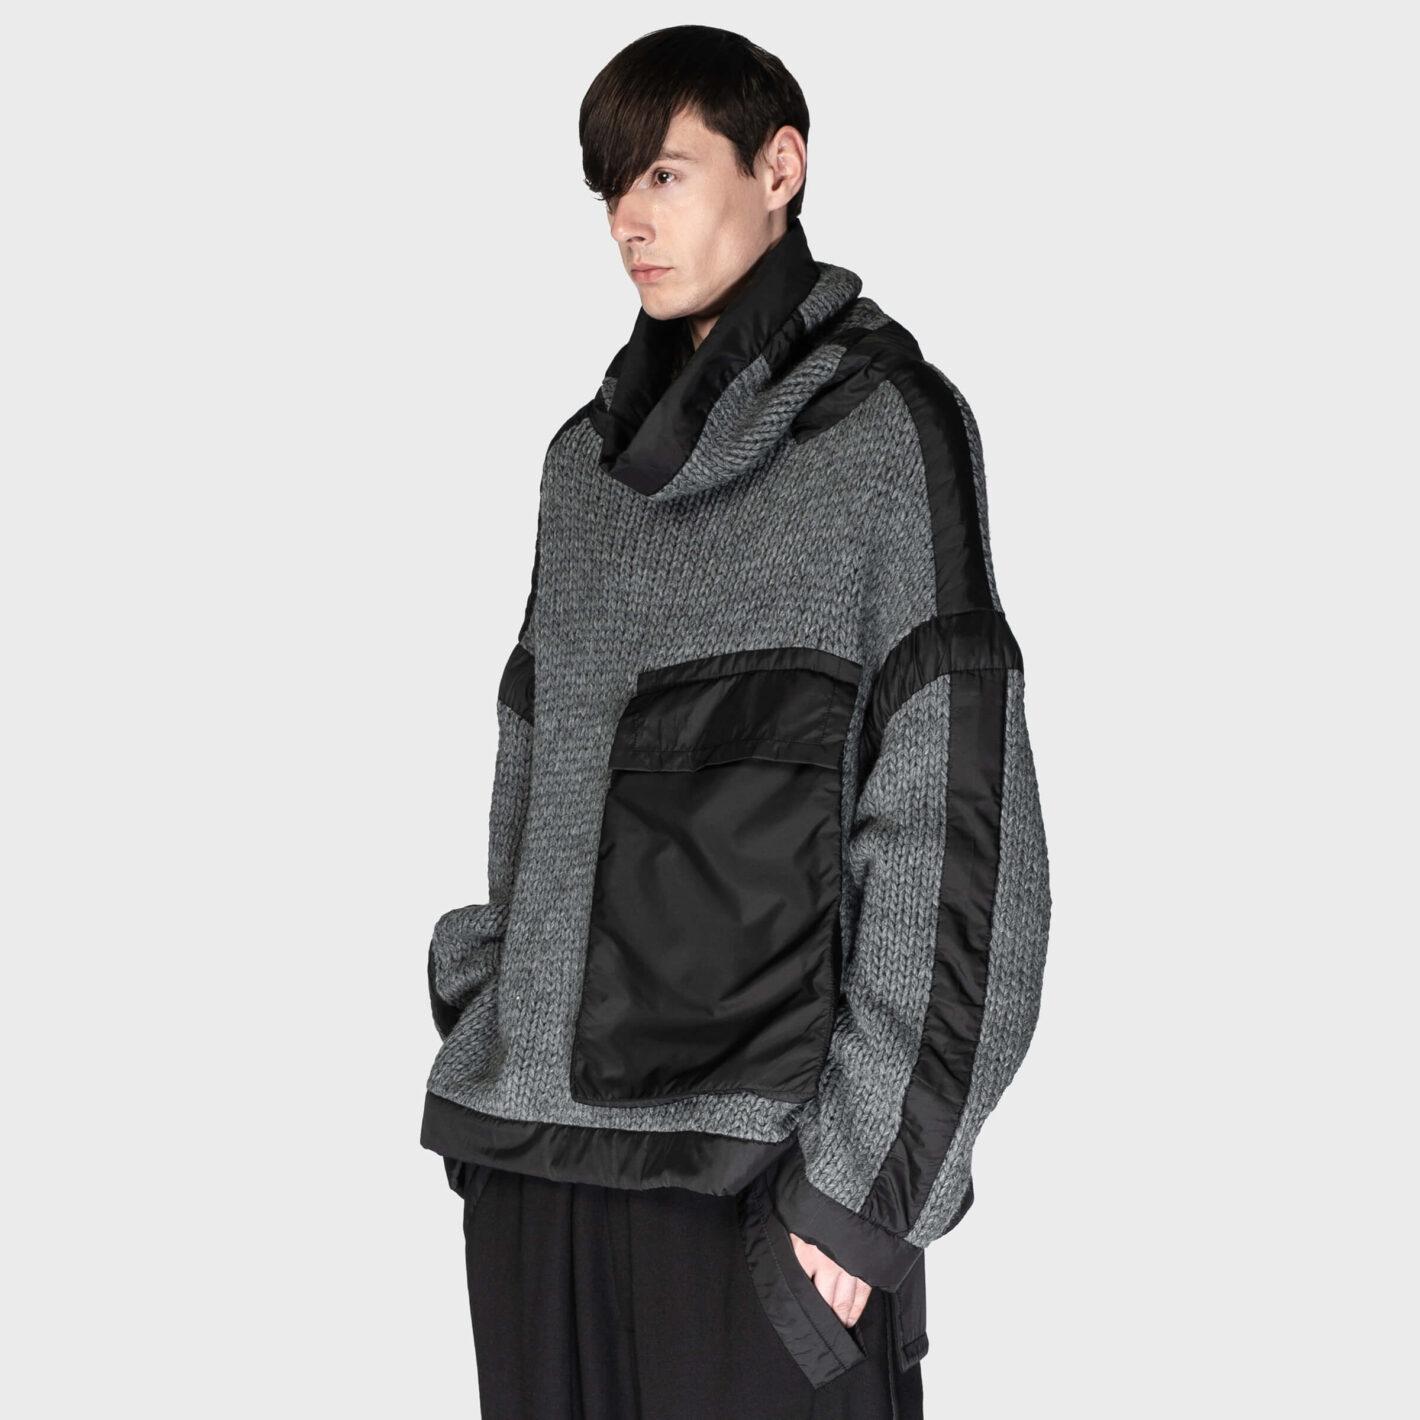 SOSNOVSKA Going Beyond Sweater